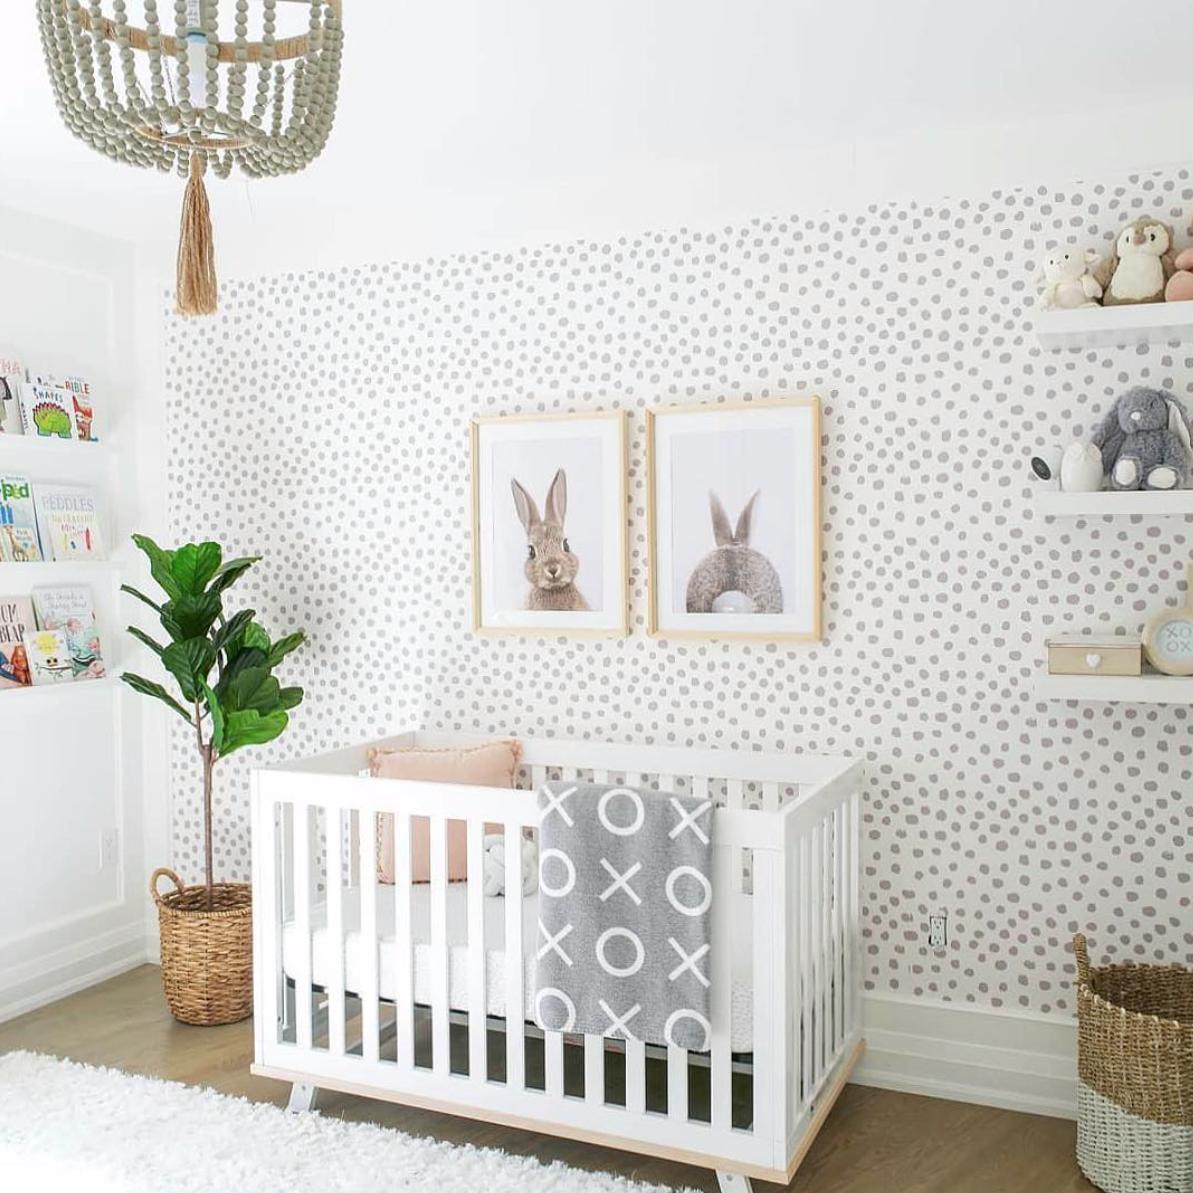 Here S What S Trending In The Nursery This Week Project Nursery Baby Nursery Decor Nursery Baby Room Baby Girl Nursery Room